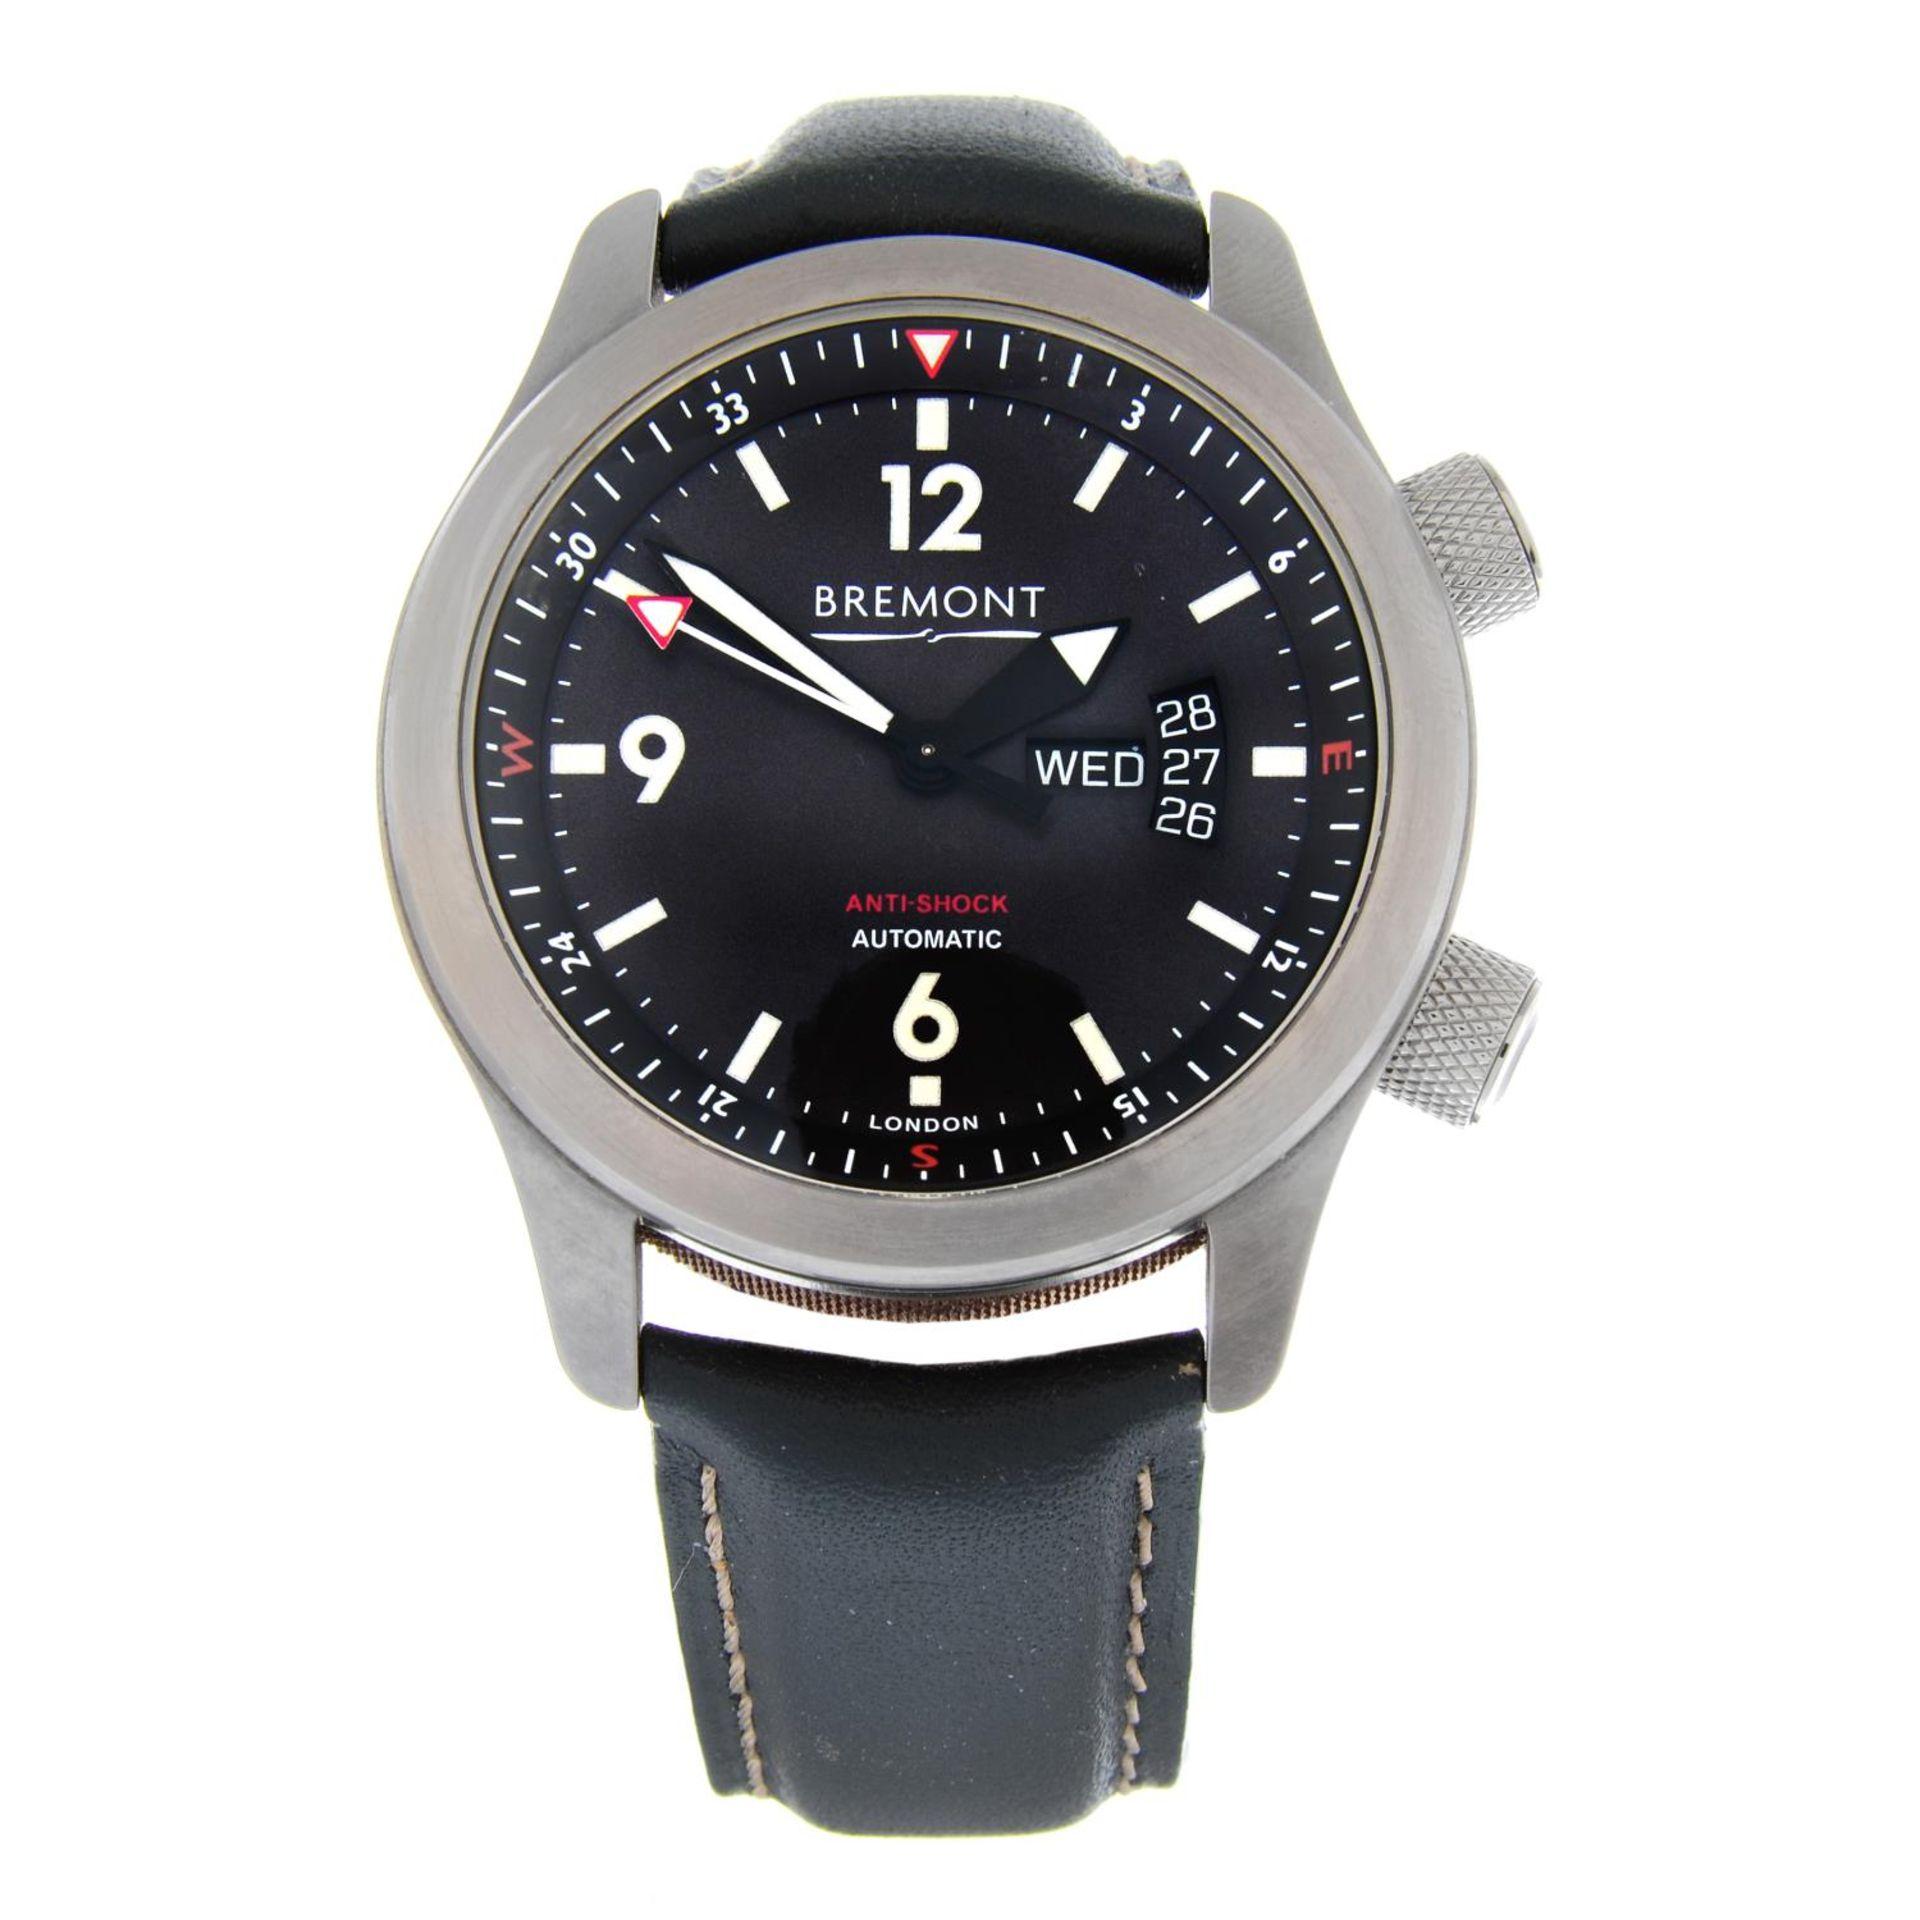 CURRENT MODEL: BREMONT - a U22 wrist watch.